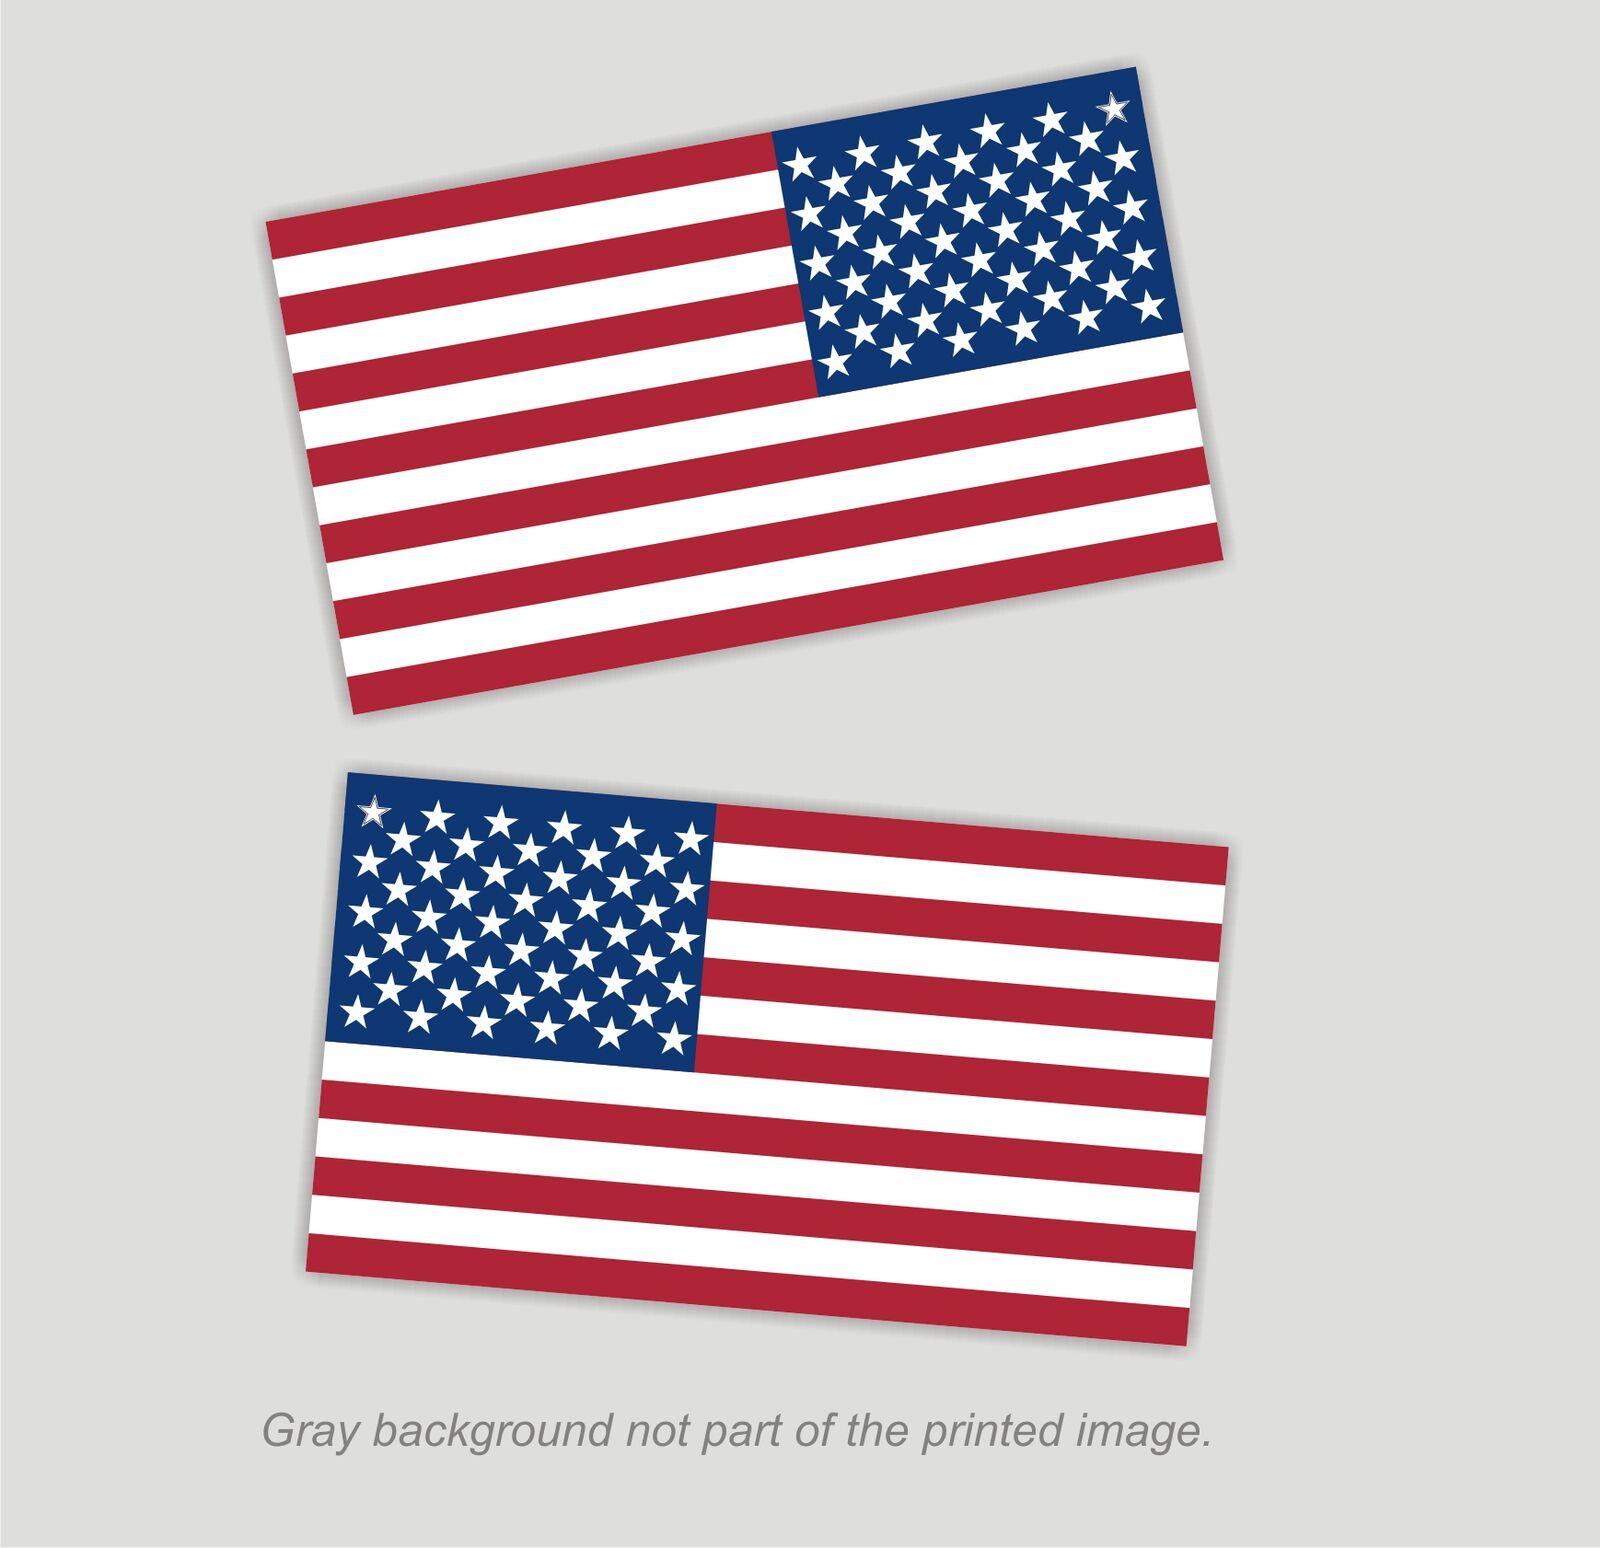 5588b42c86d American Flag Decals Stickers 2.375 x 4 1 RH